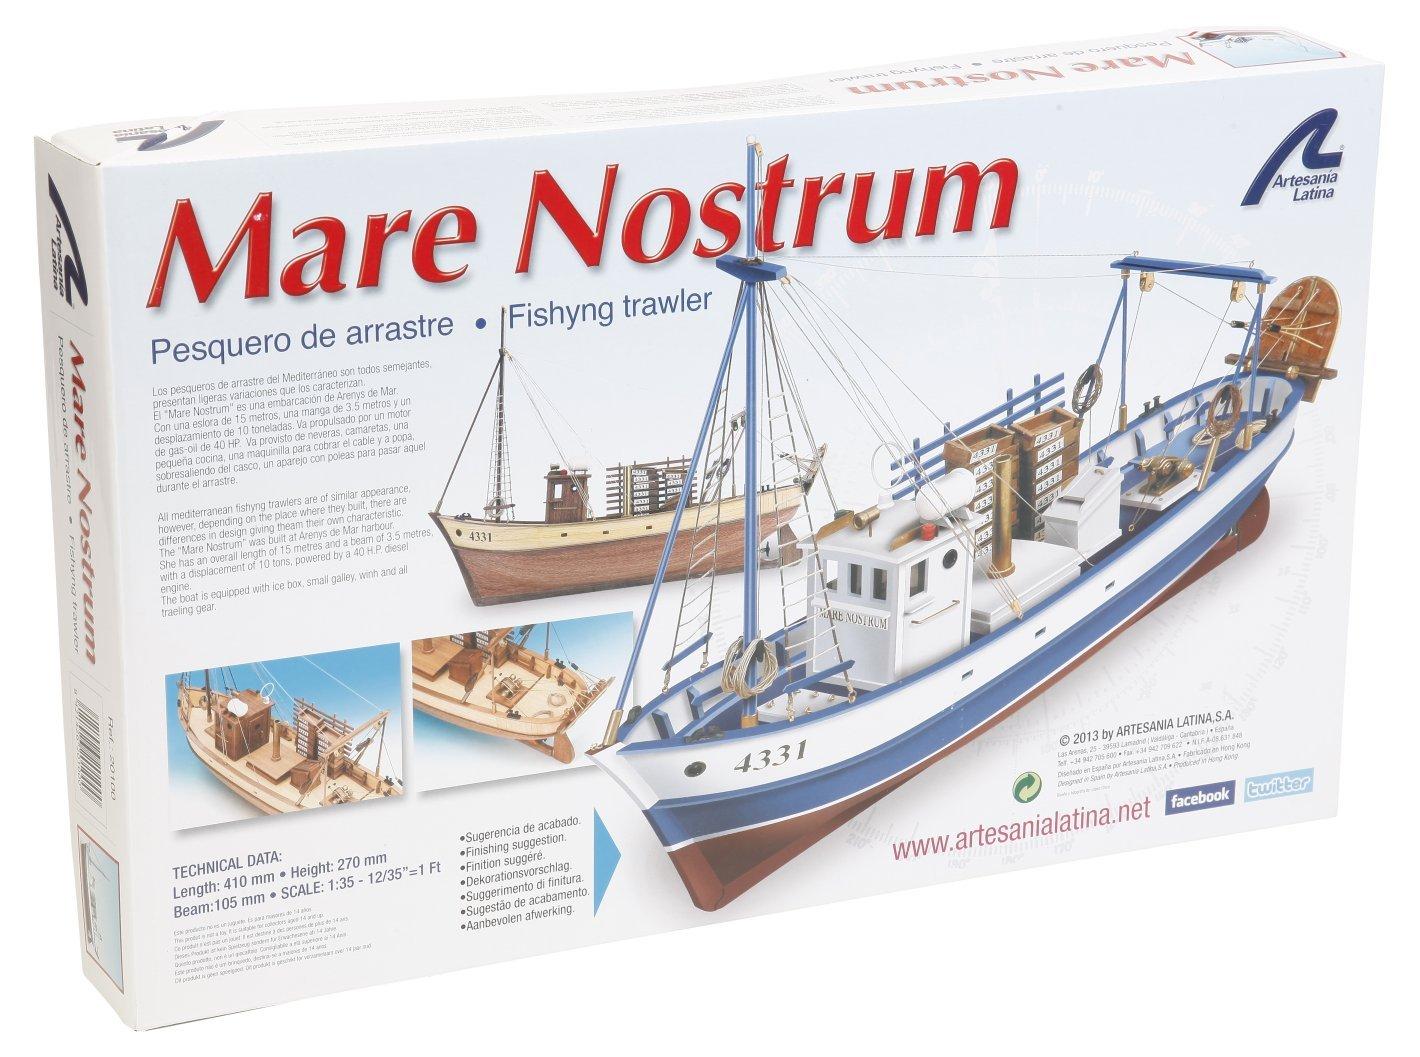 Nostrum sports medicine s&l fashions dress collection